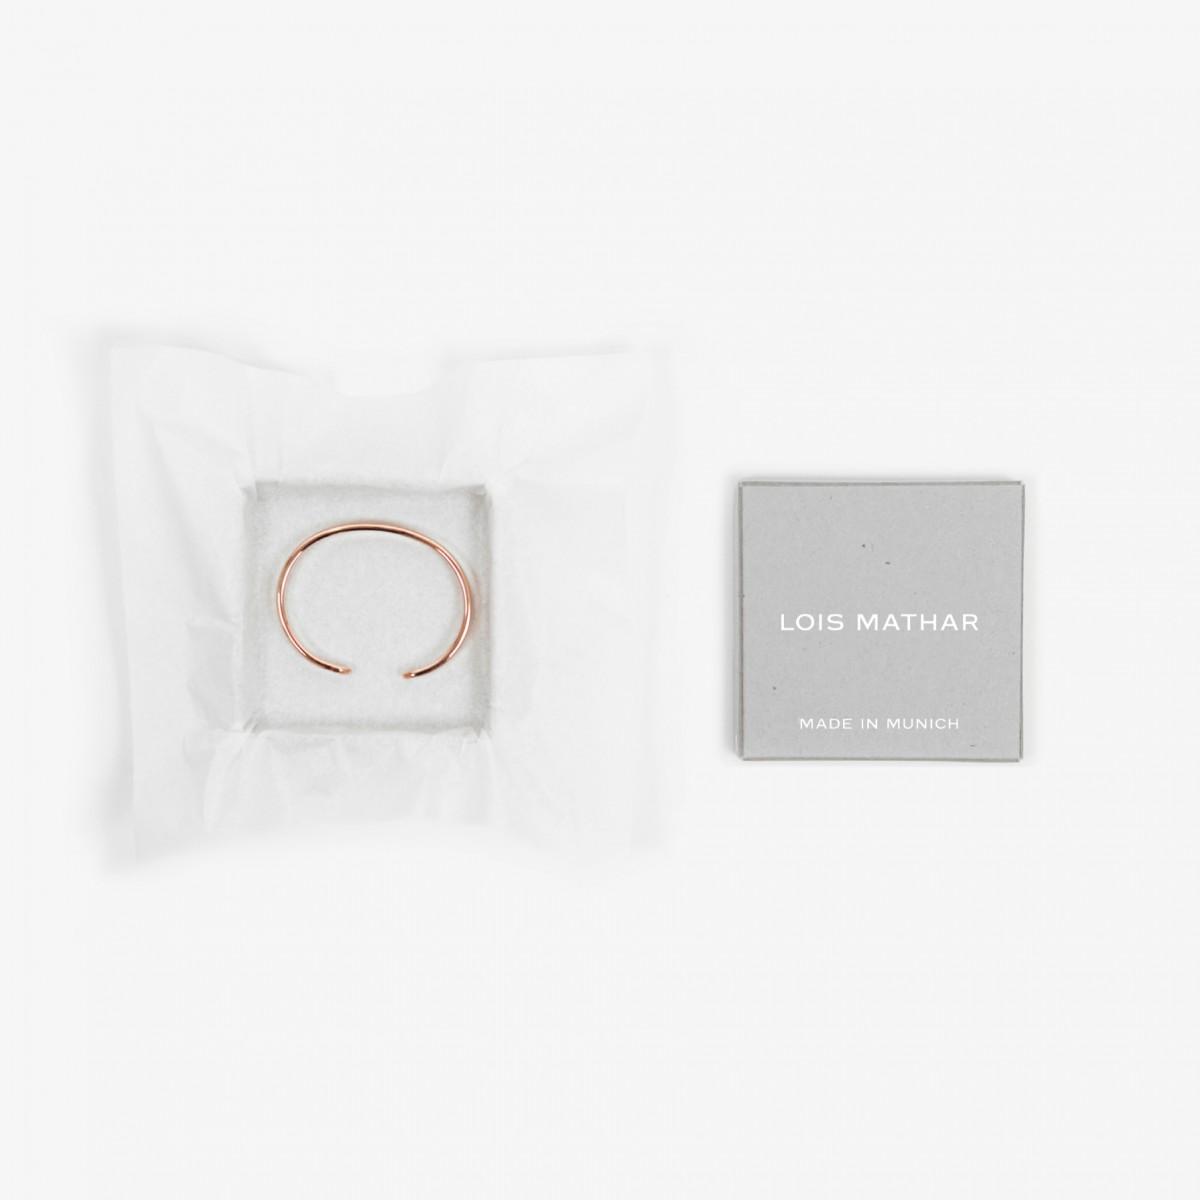 Lois Mathar, Armband Kupfer, mittel, 5 mm breit